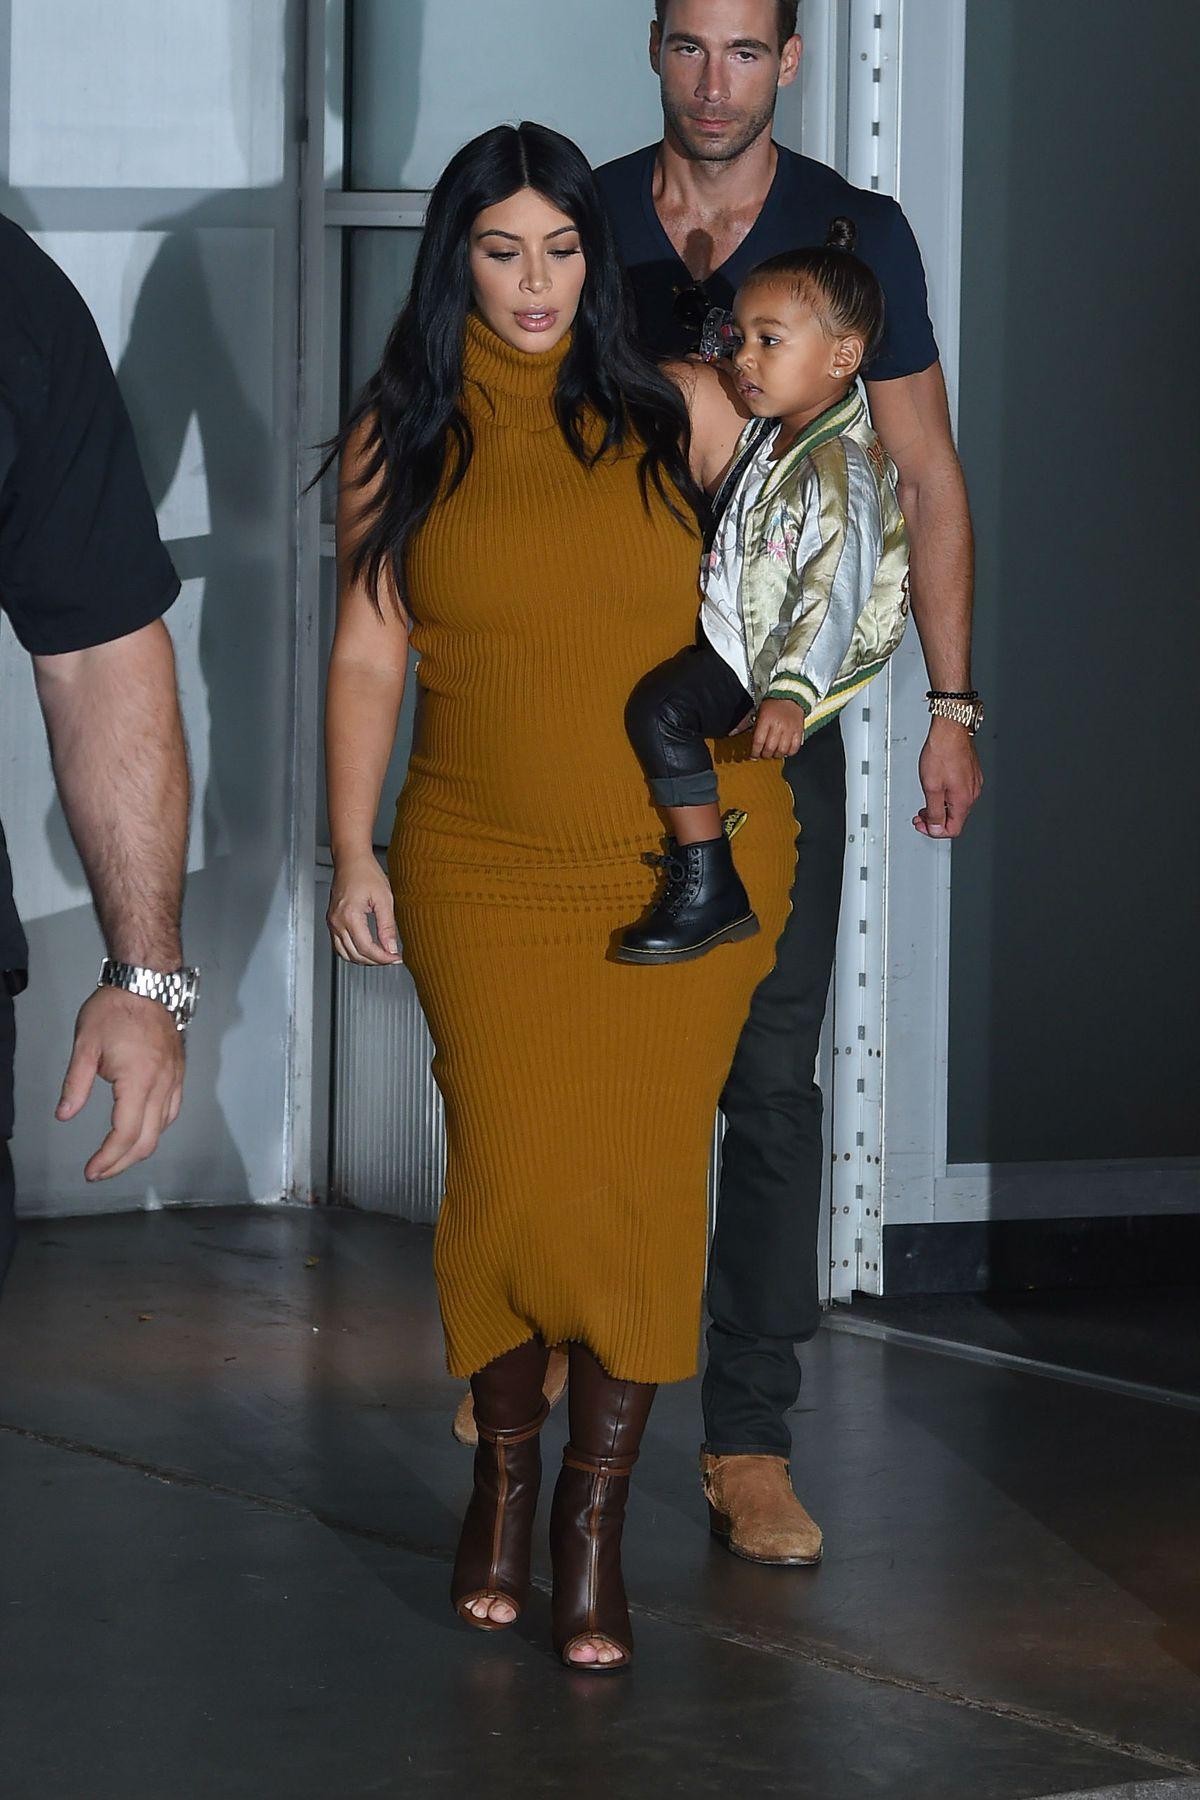 4d12619d567e5 An Obsessive Comparison of Kim Kardashian's Pregnancy Styles - Racked